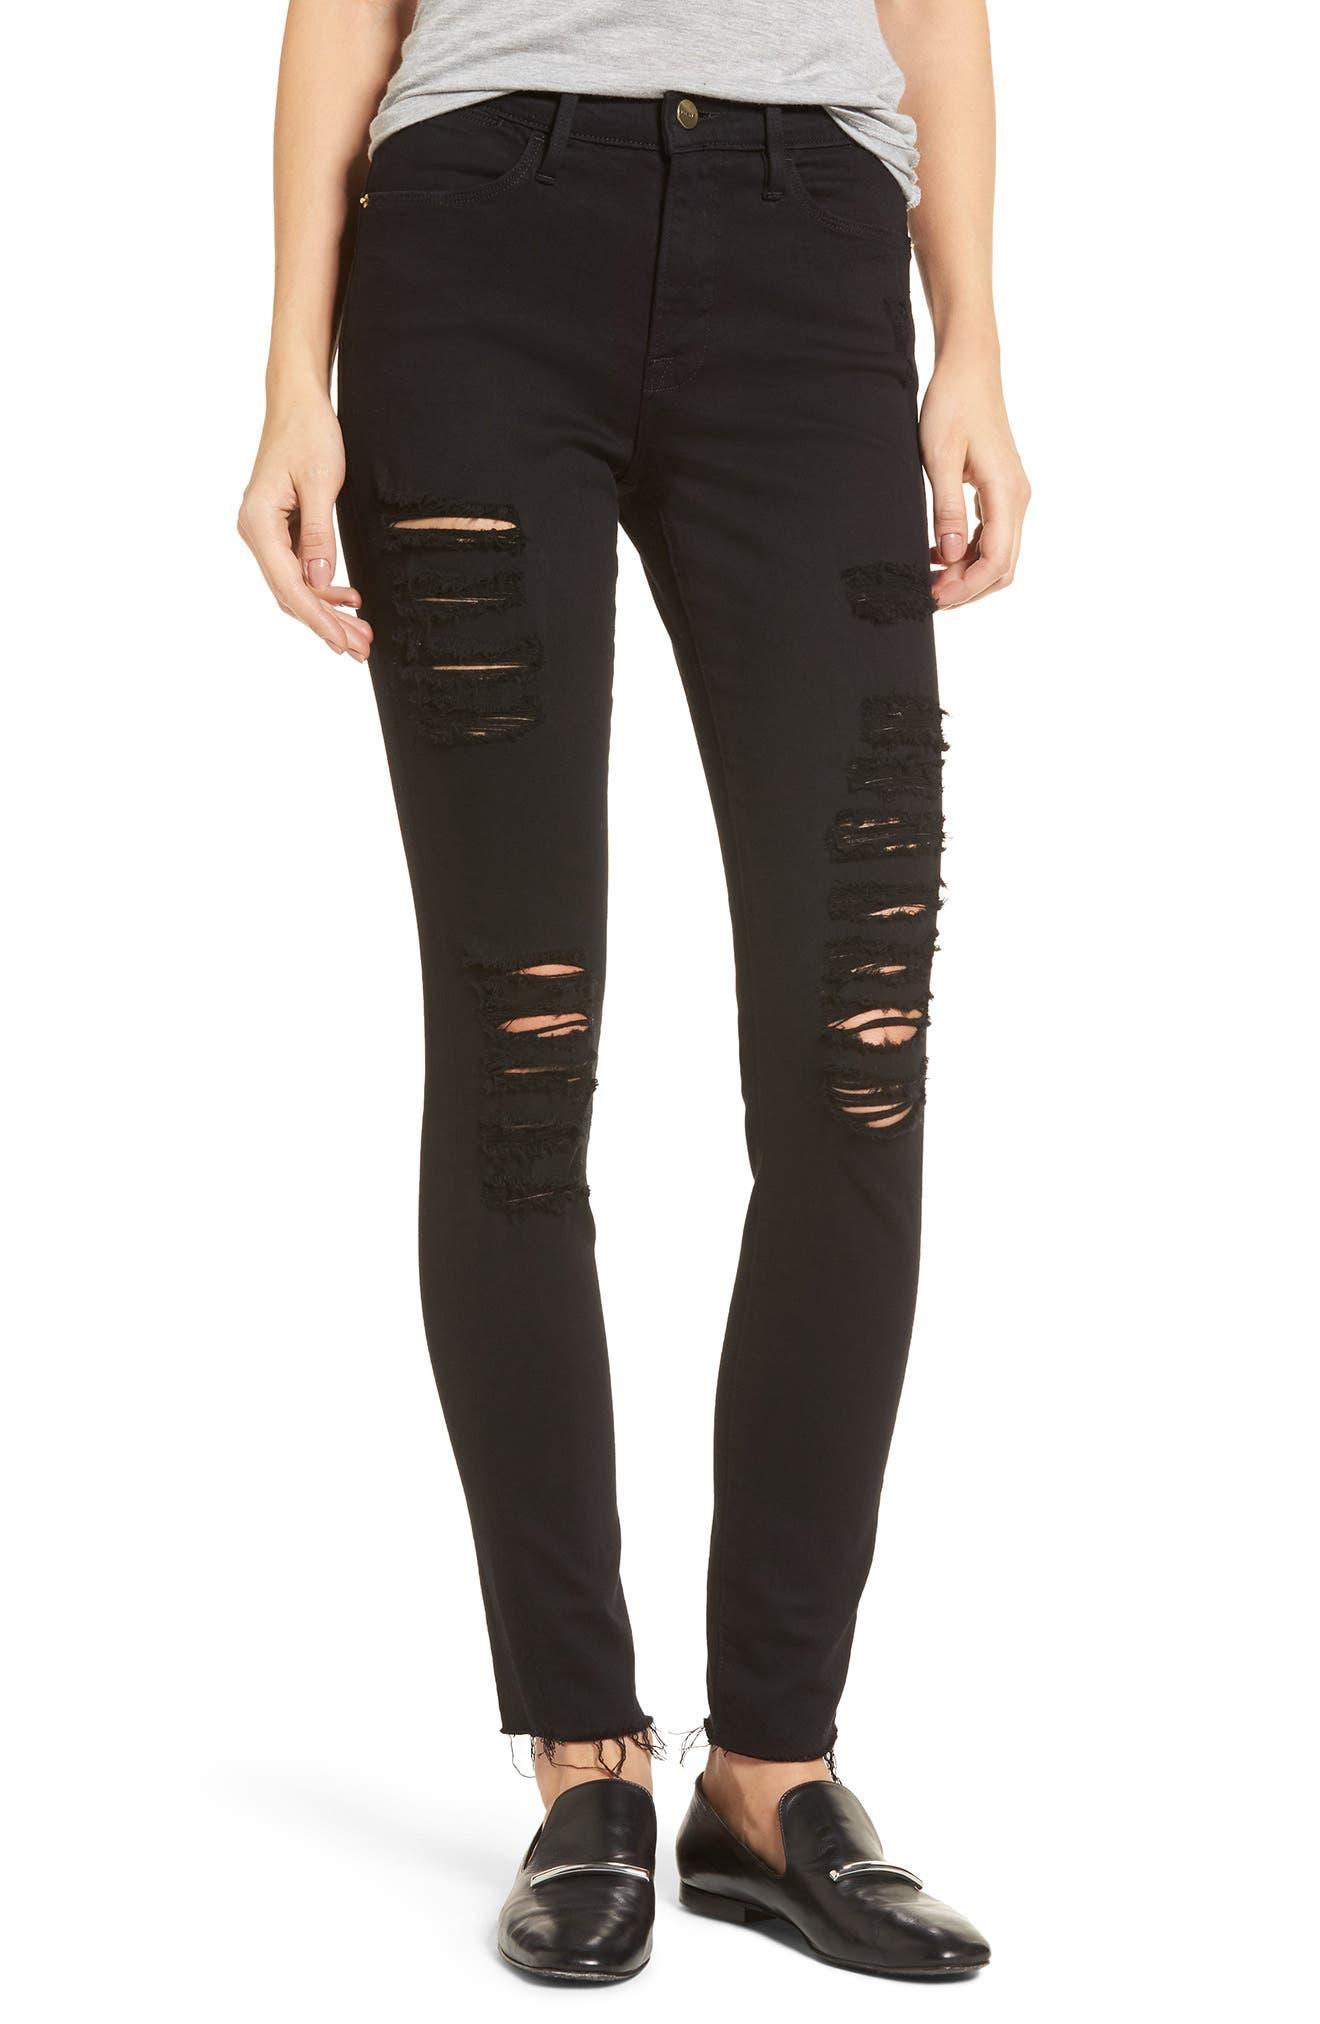 Le Color High Waist Skinny Jeans,                         Main,                         color, 003